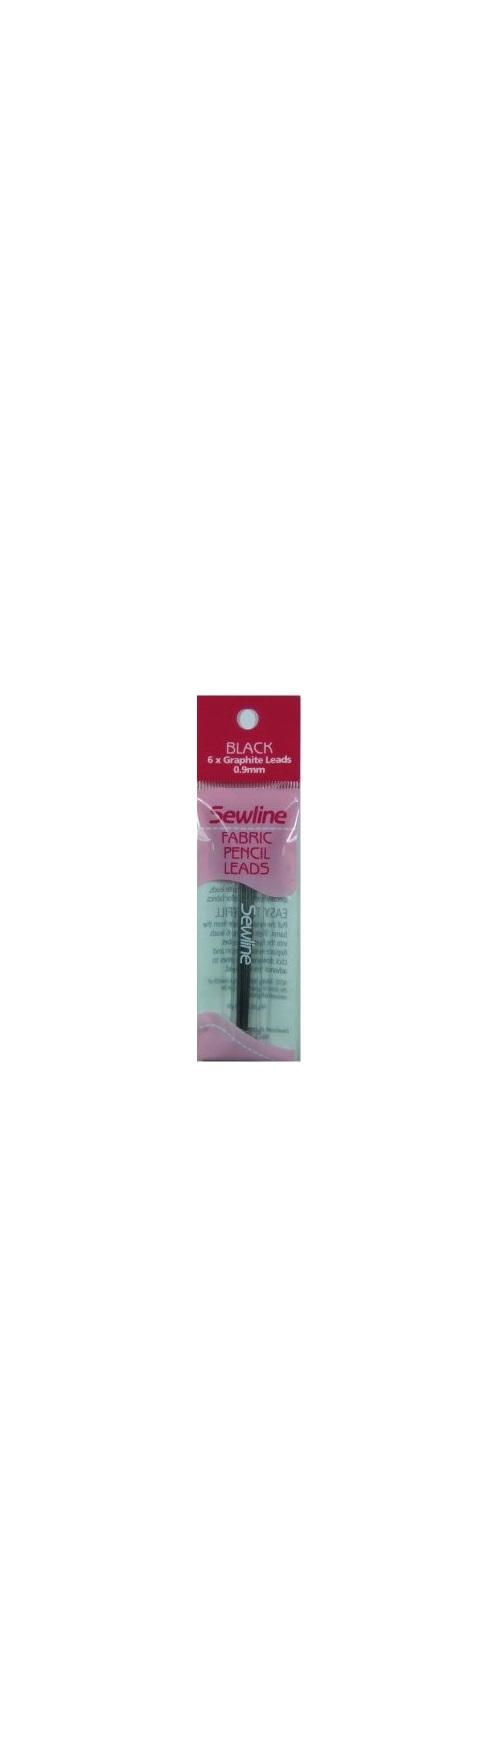 Sewline Fabric Pencil Lead Refills